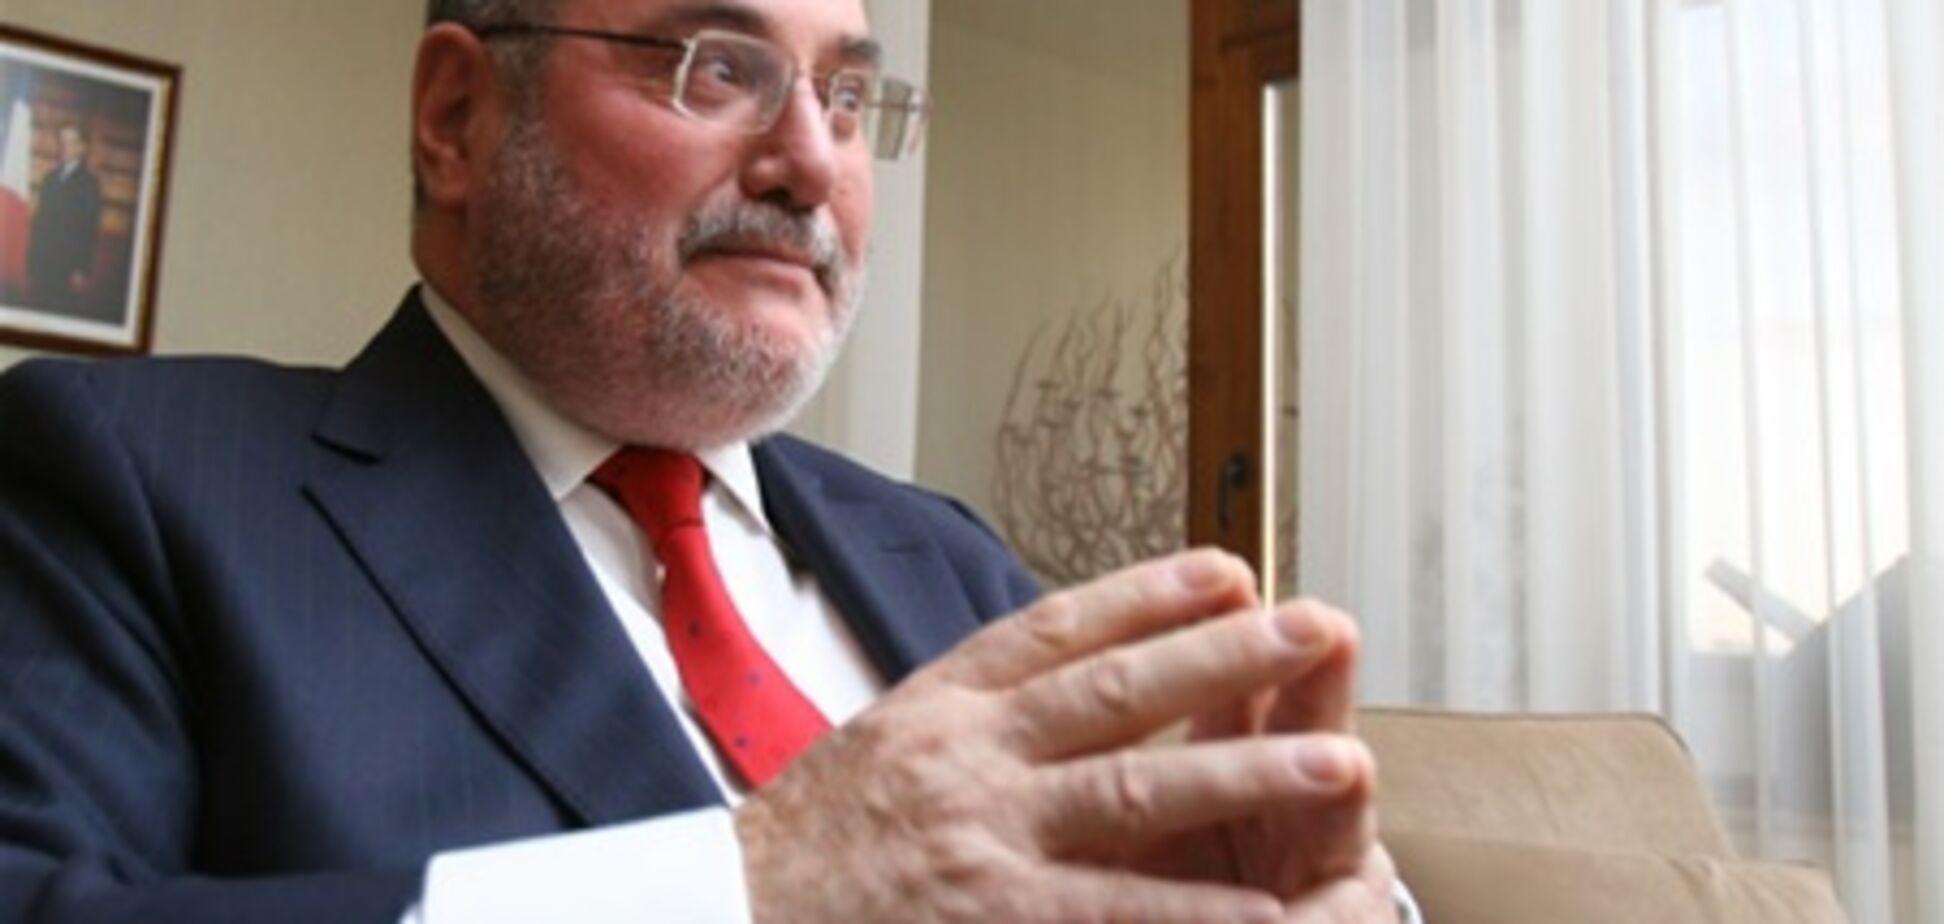 Посол Франции: 'газовое' дело Тимошенко - далеко от права